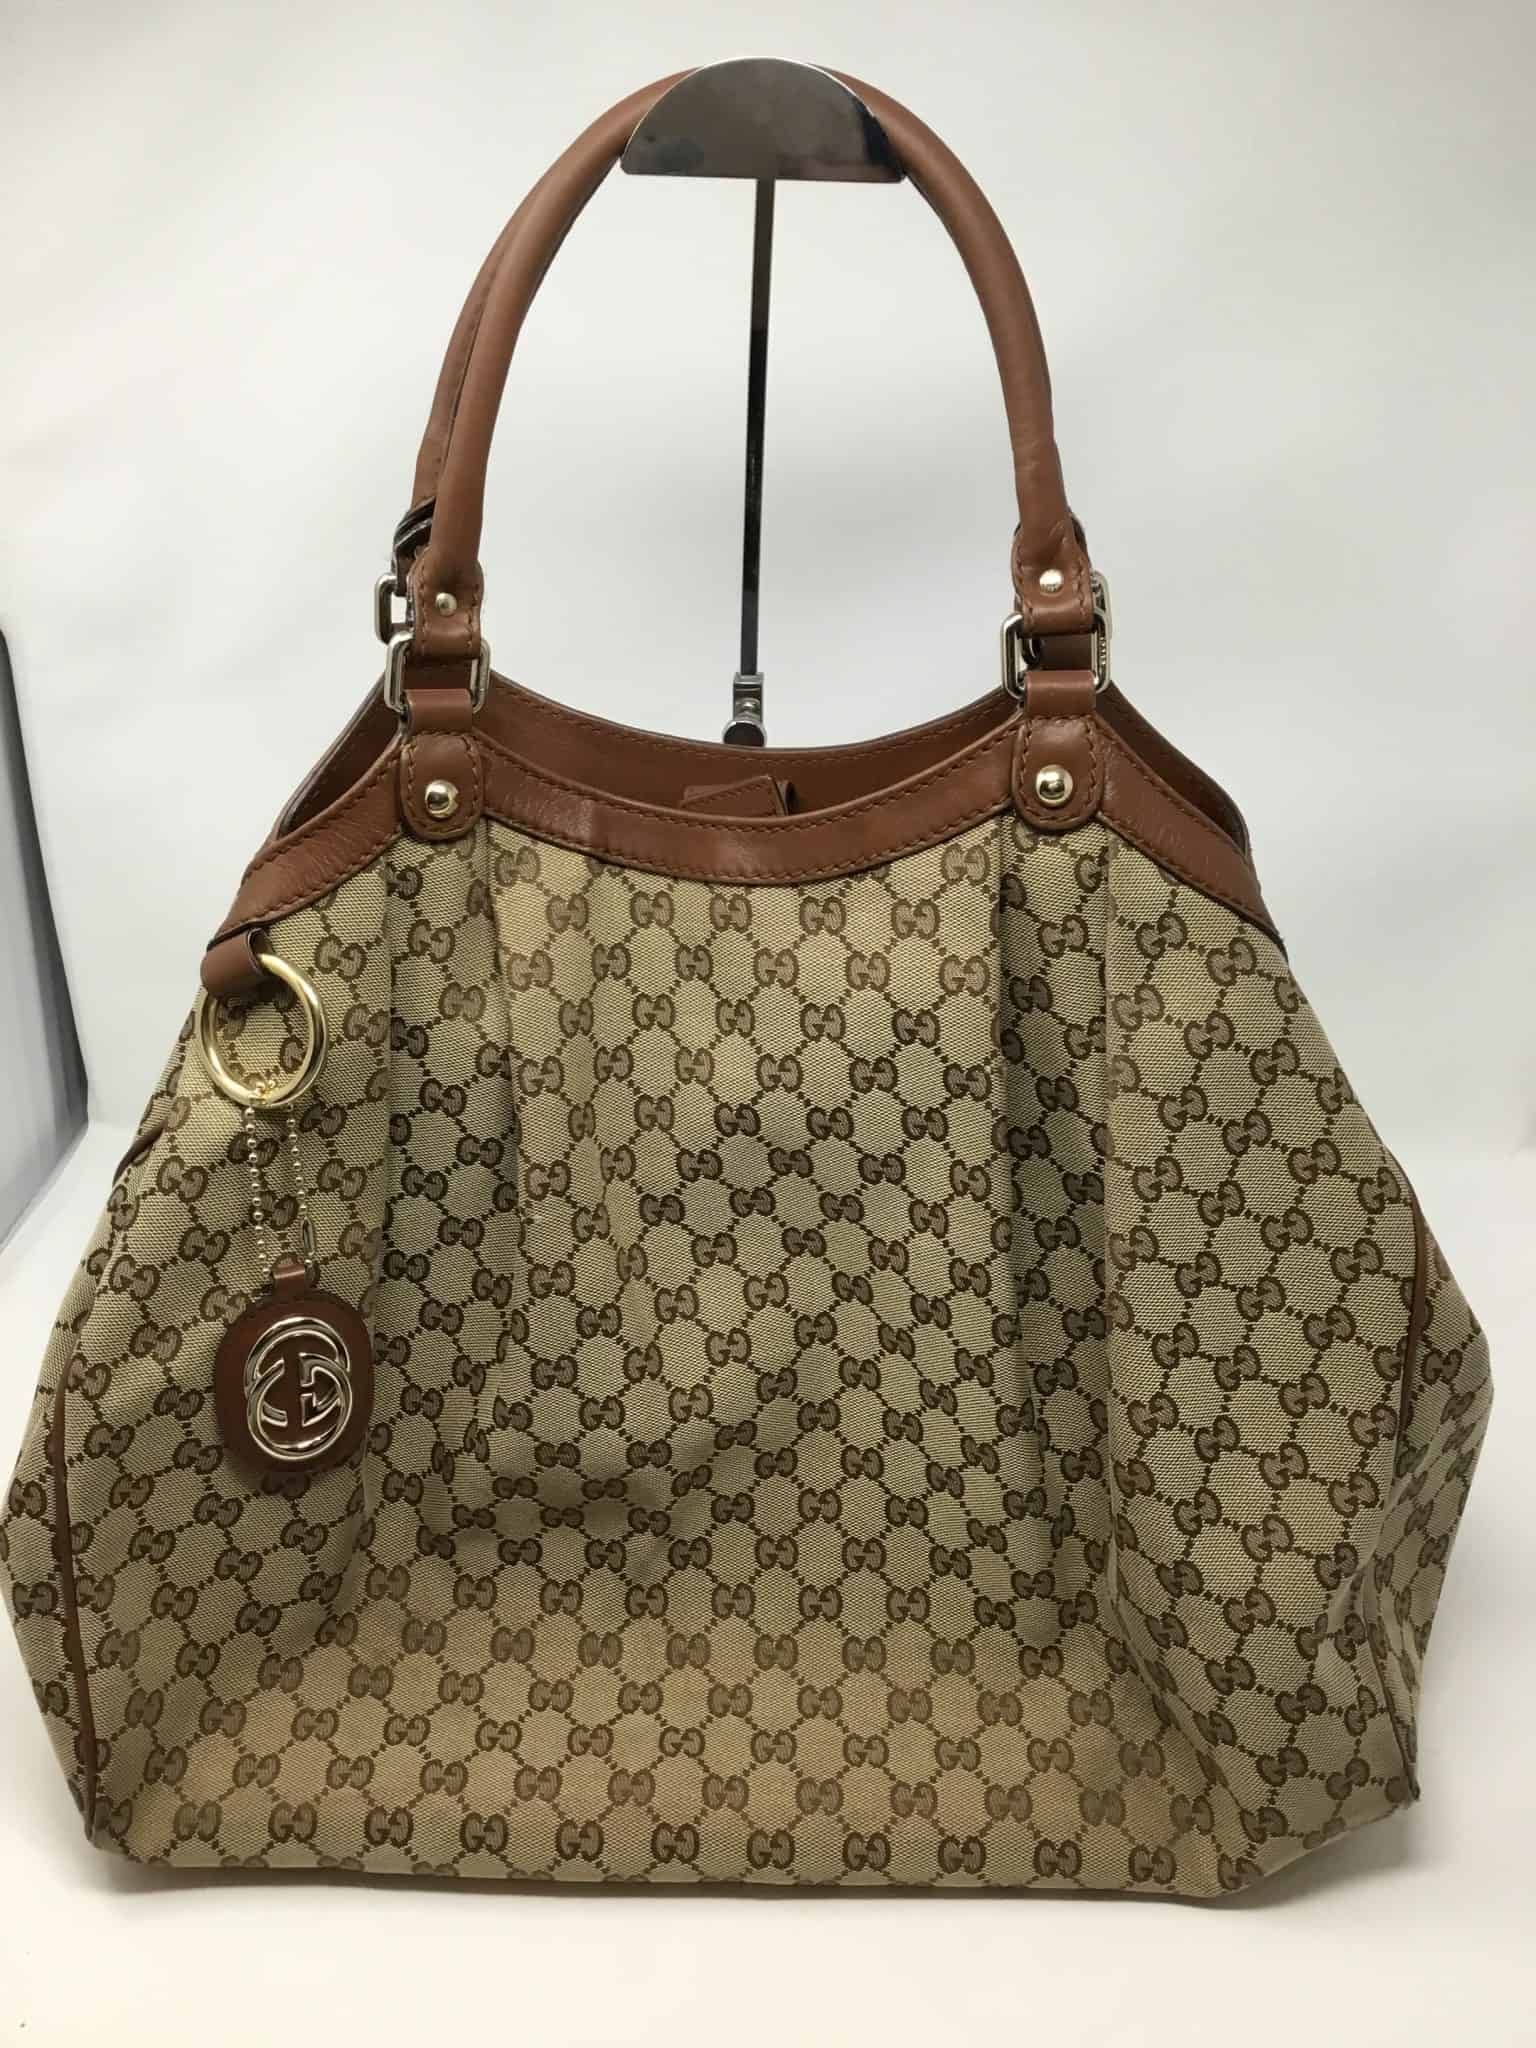 24949663a16a1d Gucci gg large sukey tote in 2019 | Gucci Addiction | Gucci, Bags ...